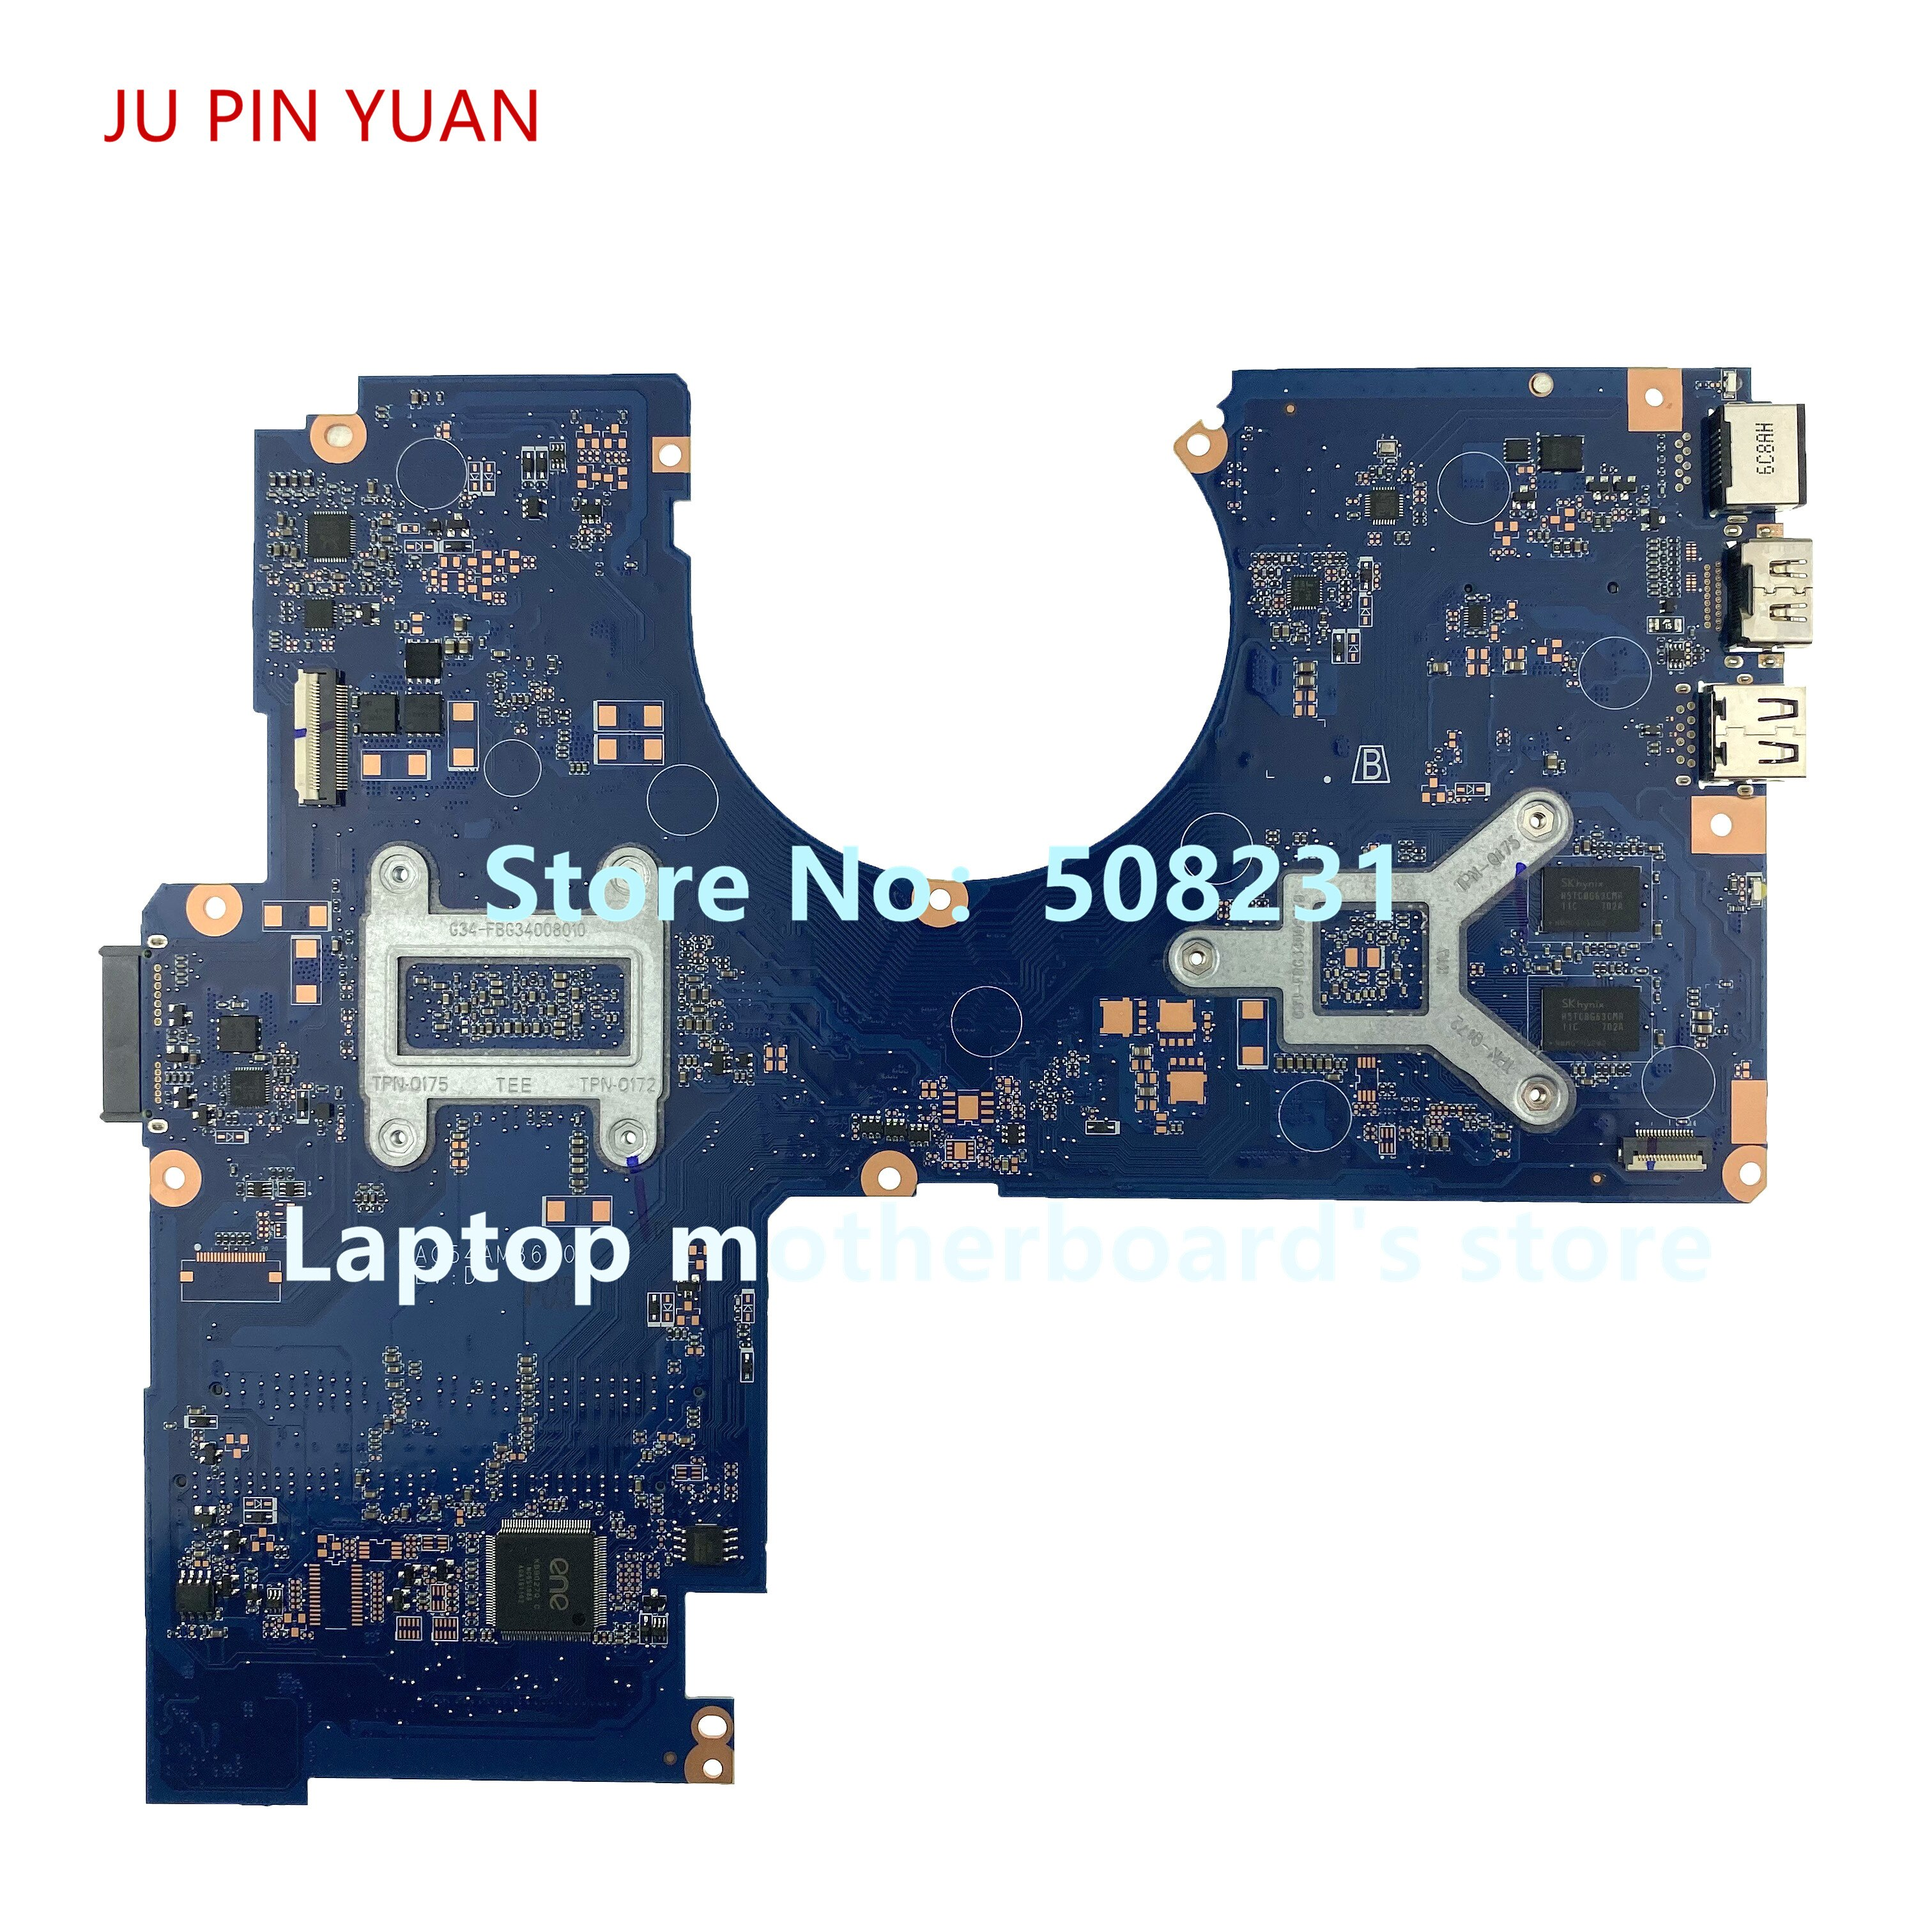 Ju pin Yuan placa base para portátil HP 15-AW 15-AU placa base 856272-001 856272-501, 856272-601 DAG54AMB6D0 100% totalmente